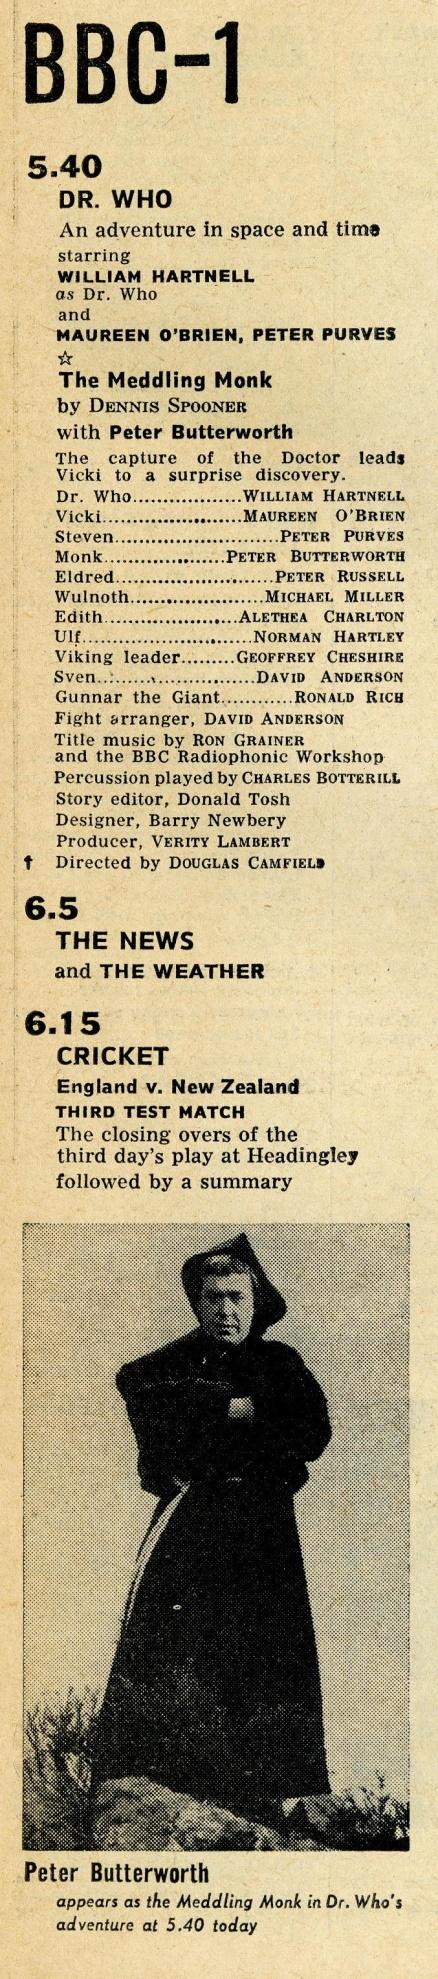 Radio Times, July 10-16, 1965